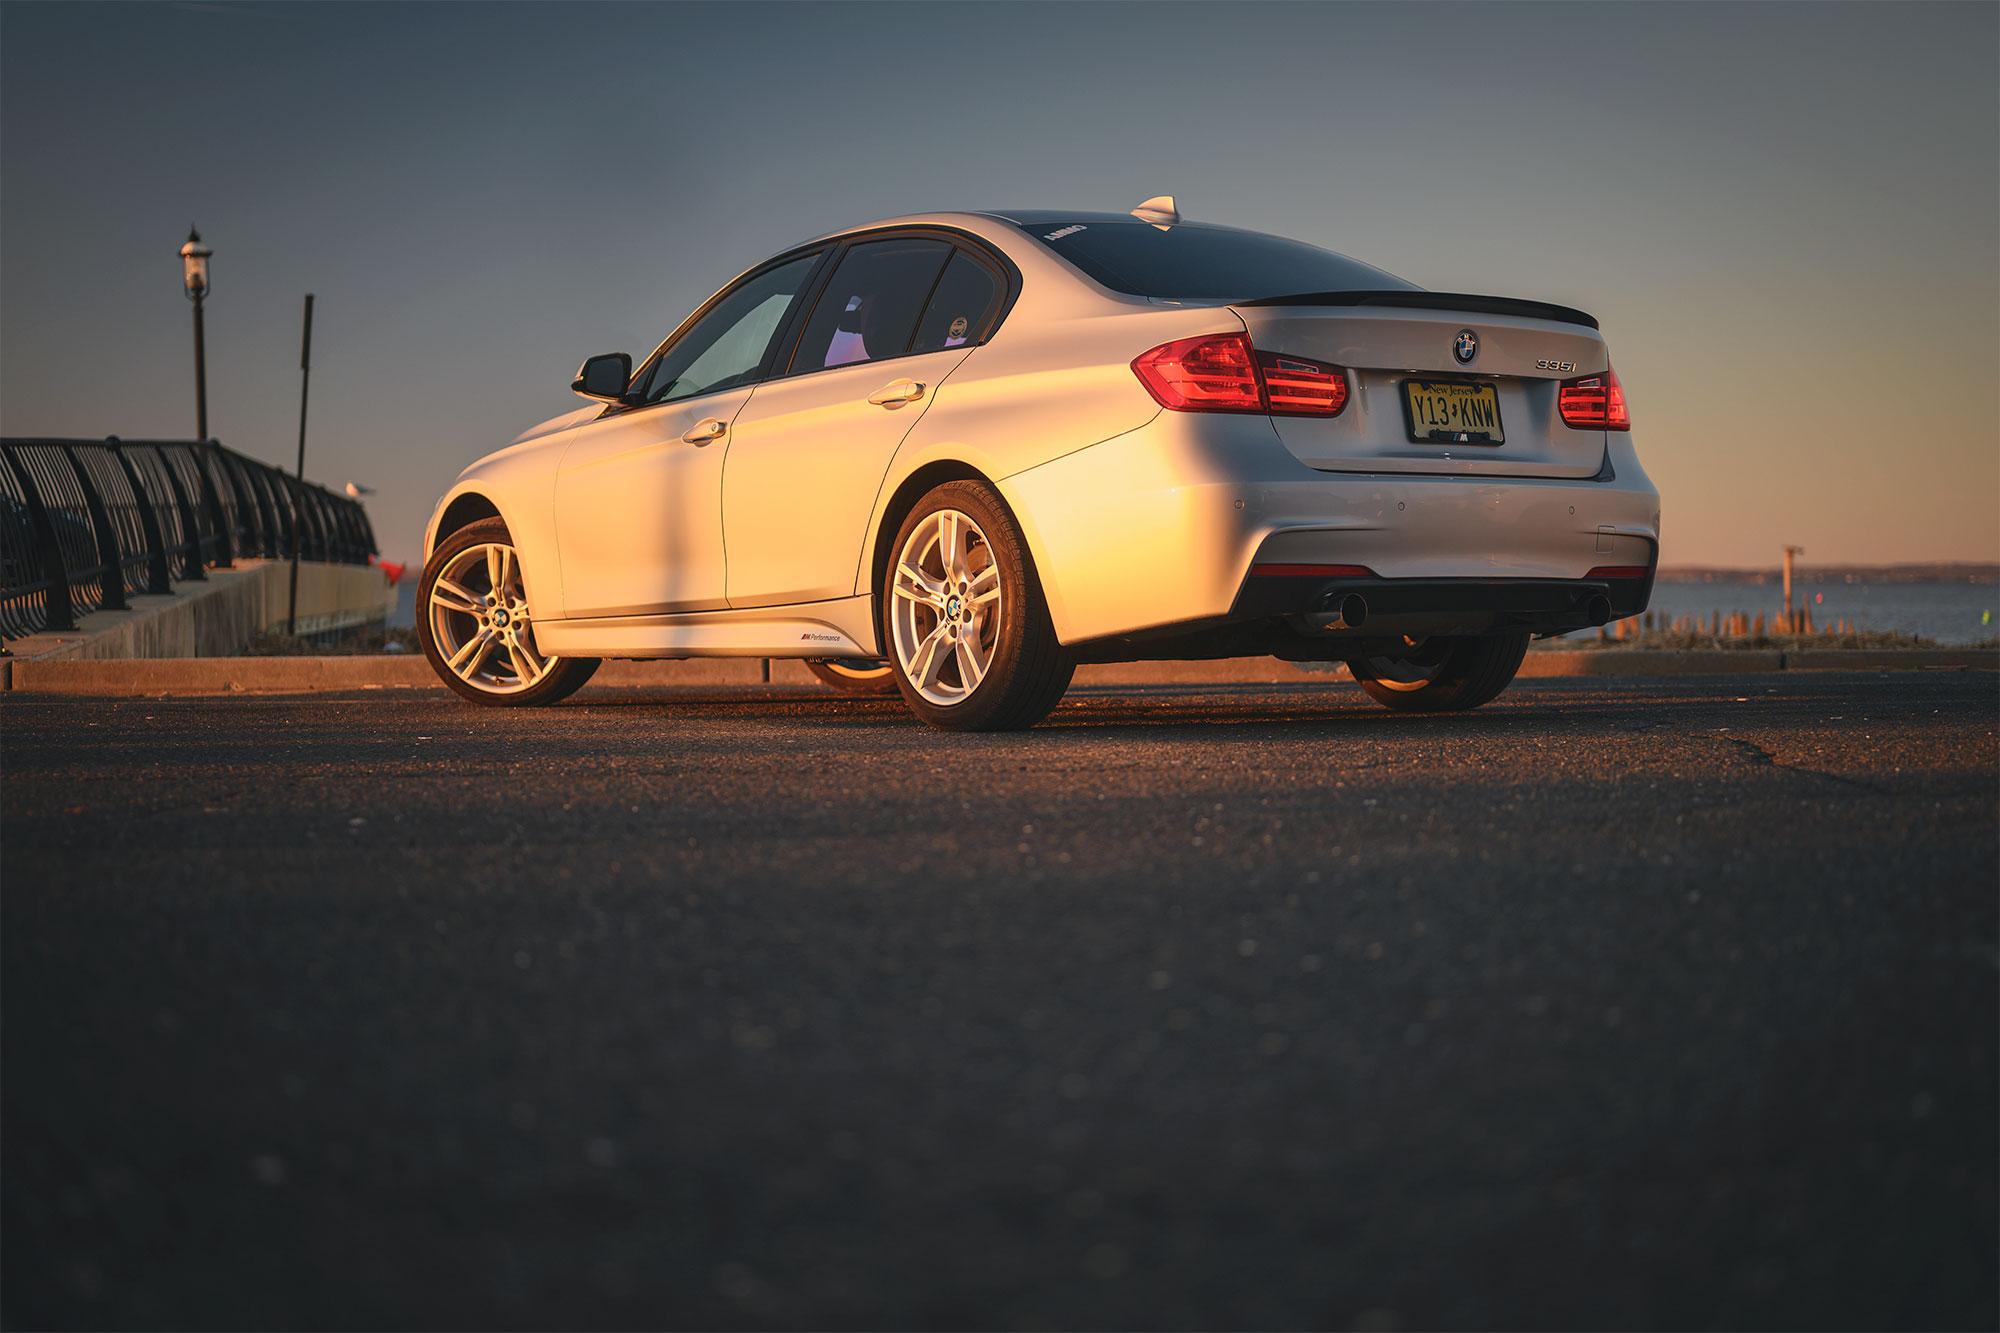 BMW 335i exhaust